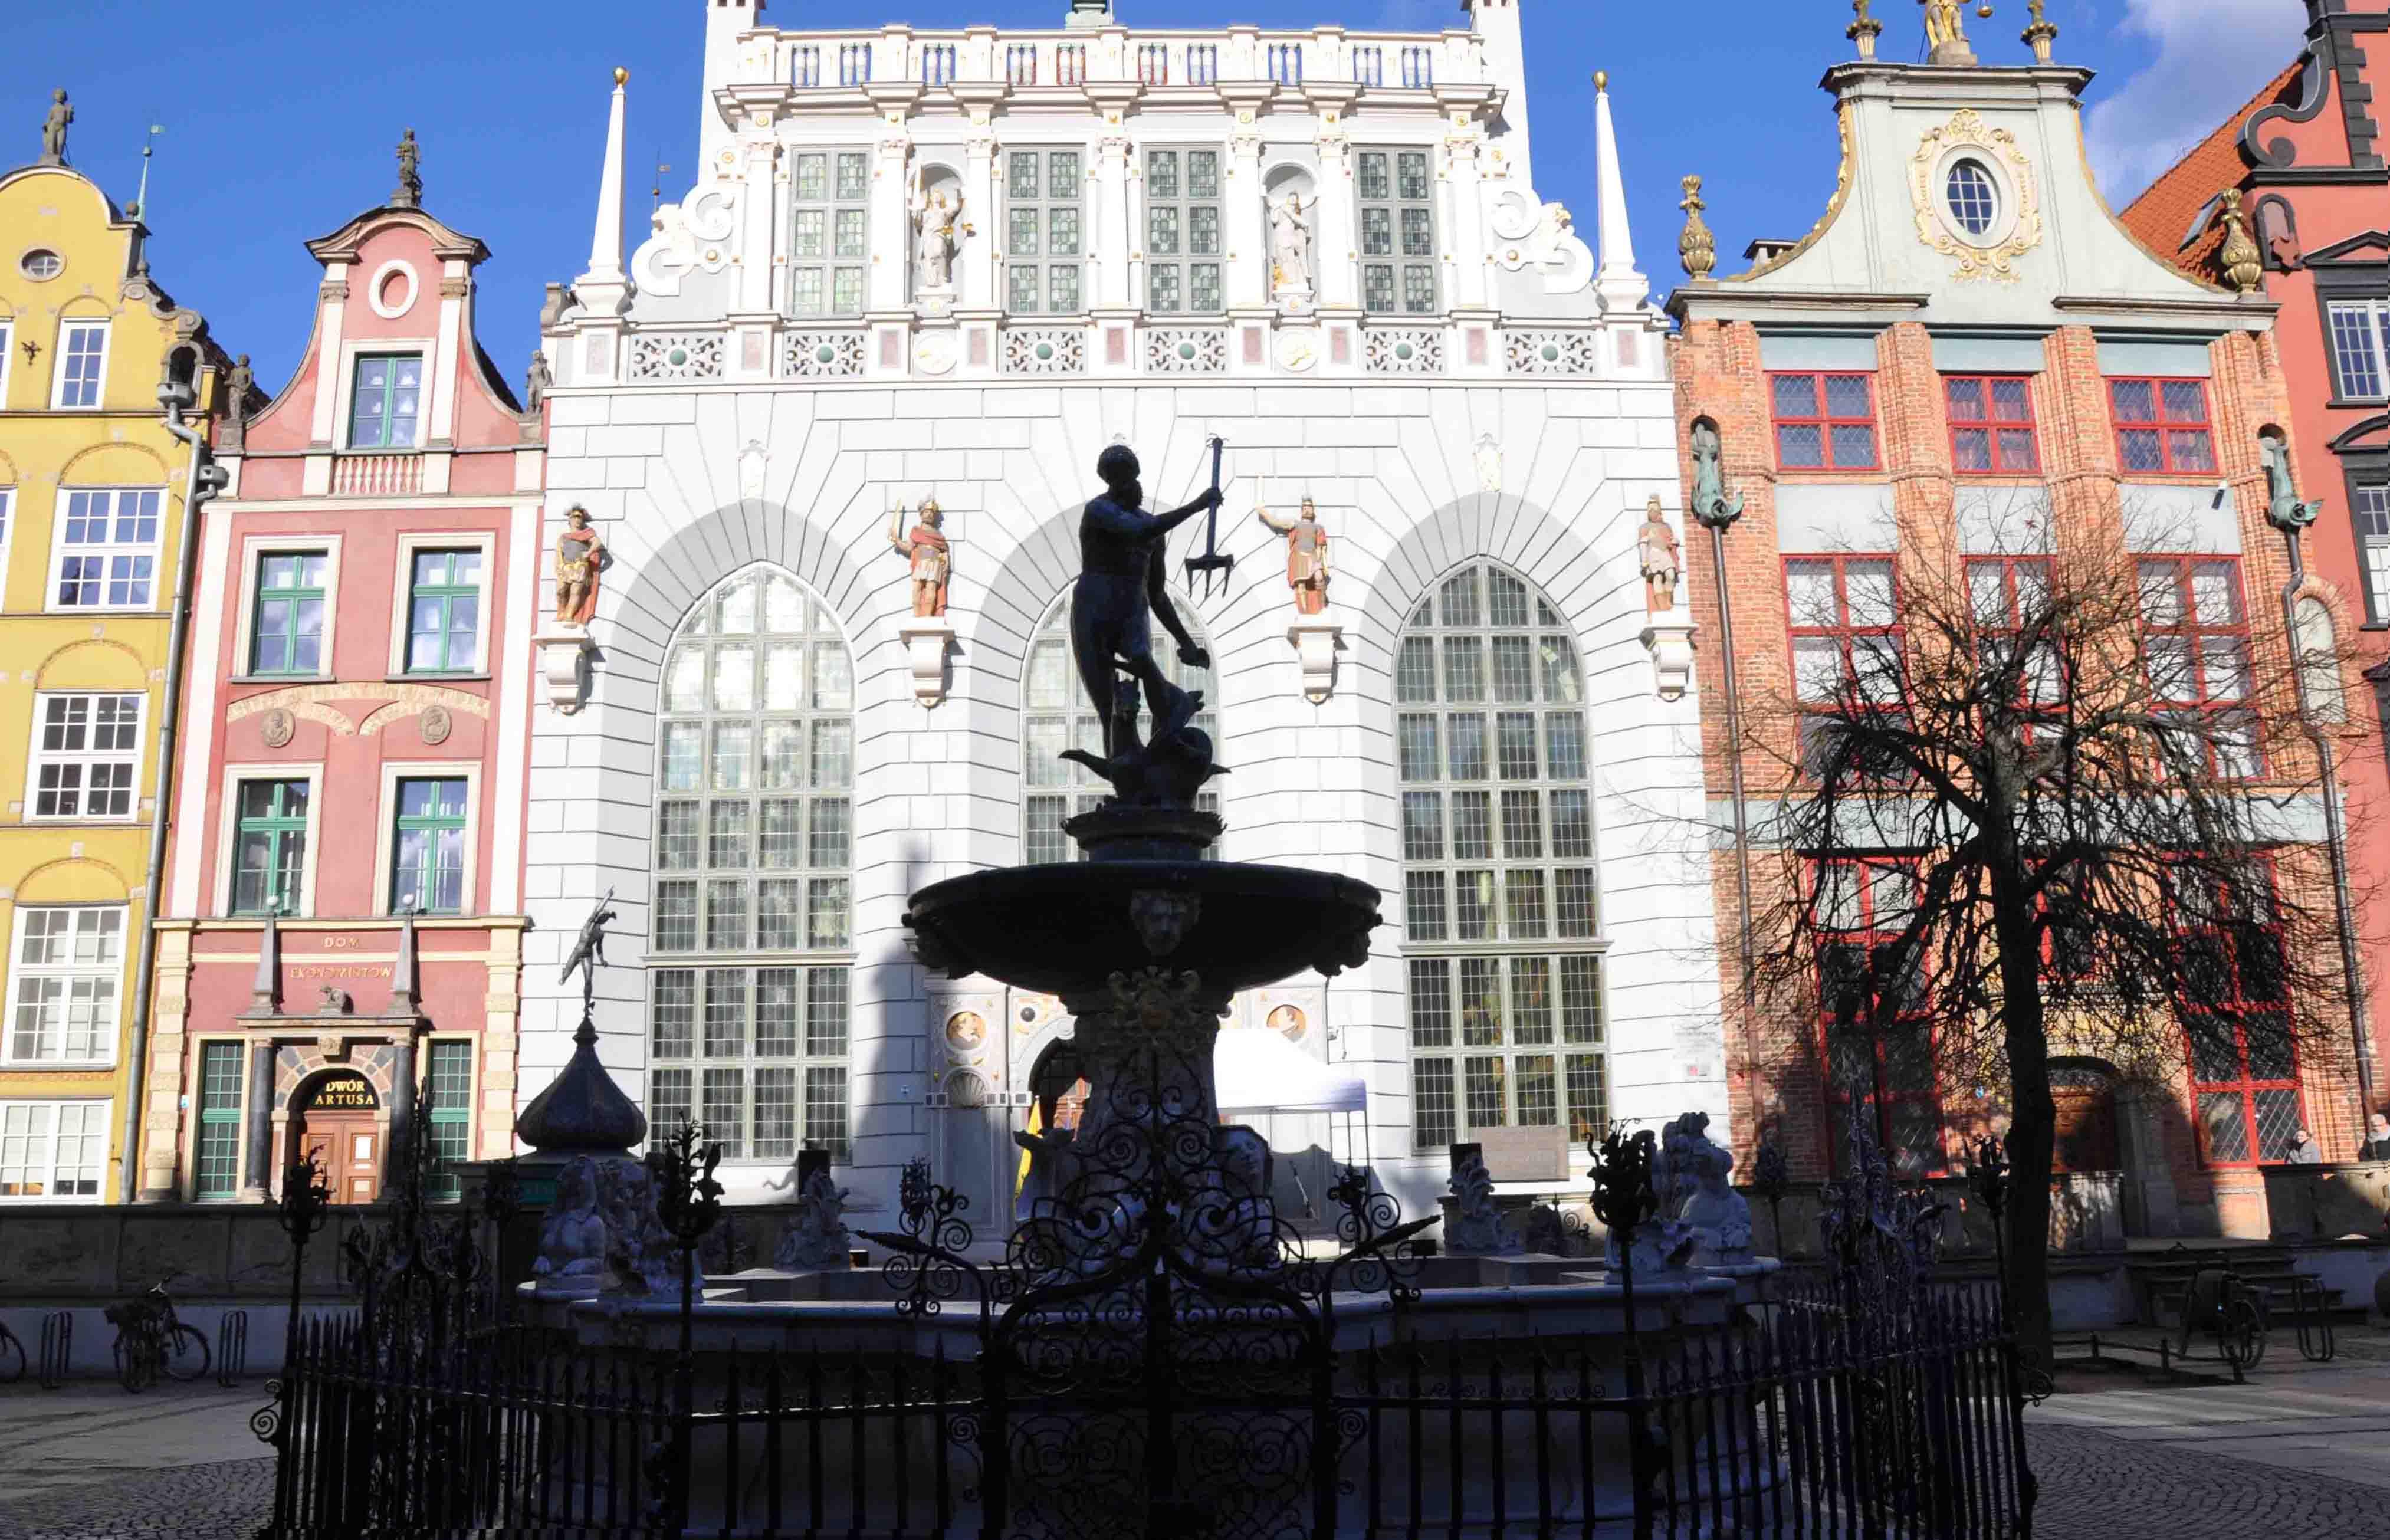 King Arthur's Court in Gdansk